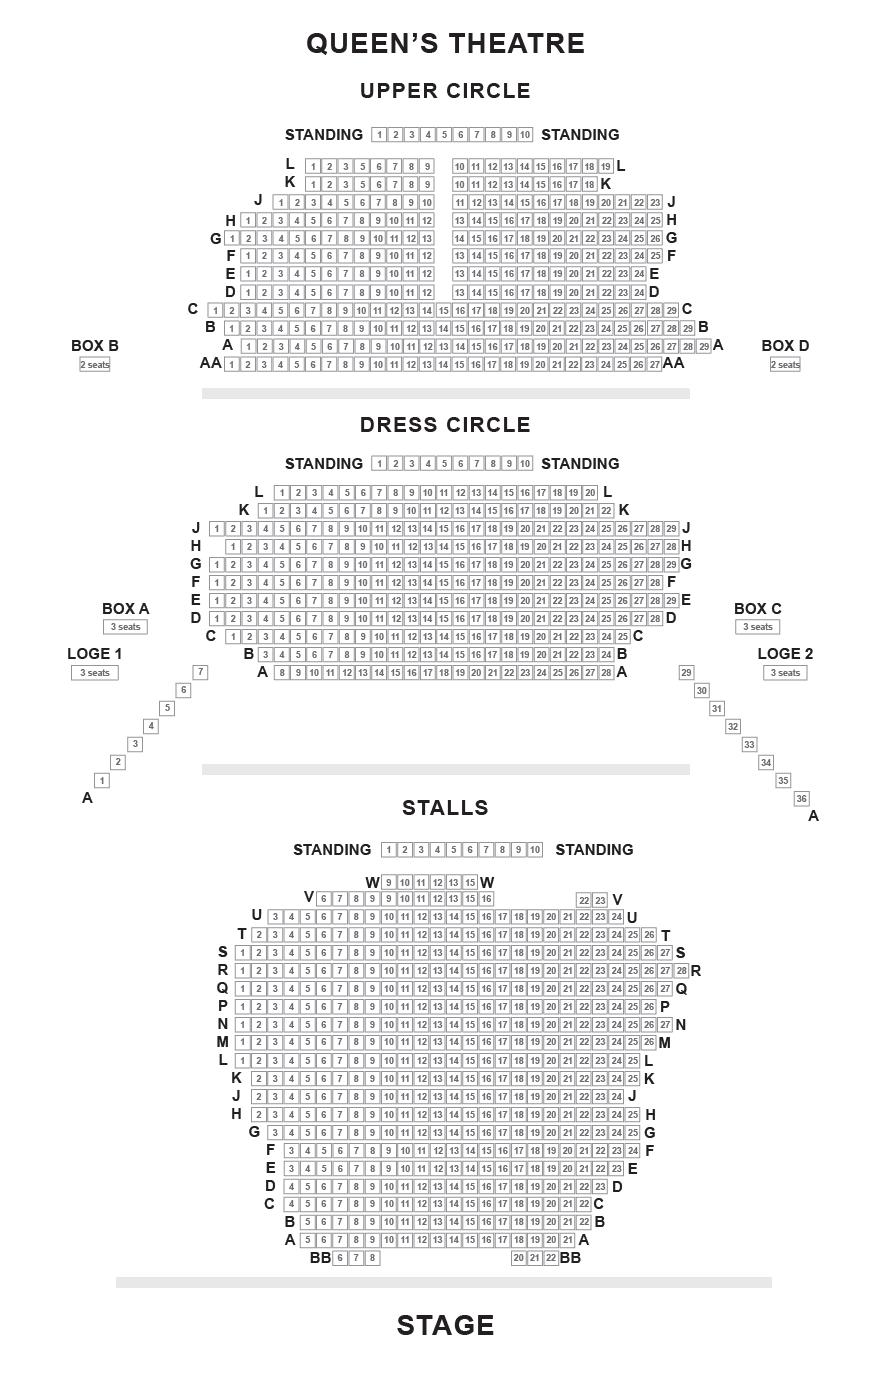 Queen's Theatre Seating Plan